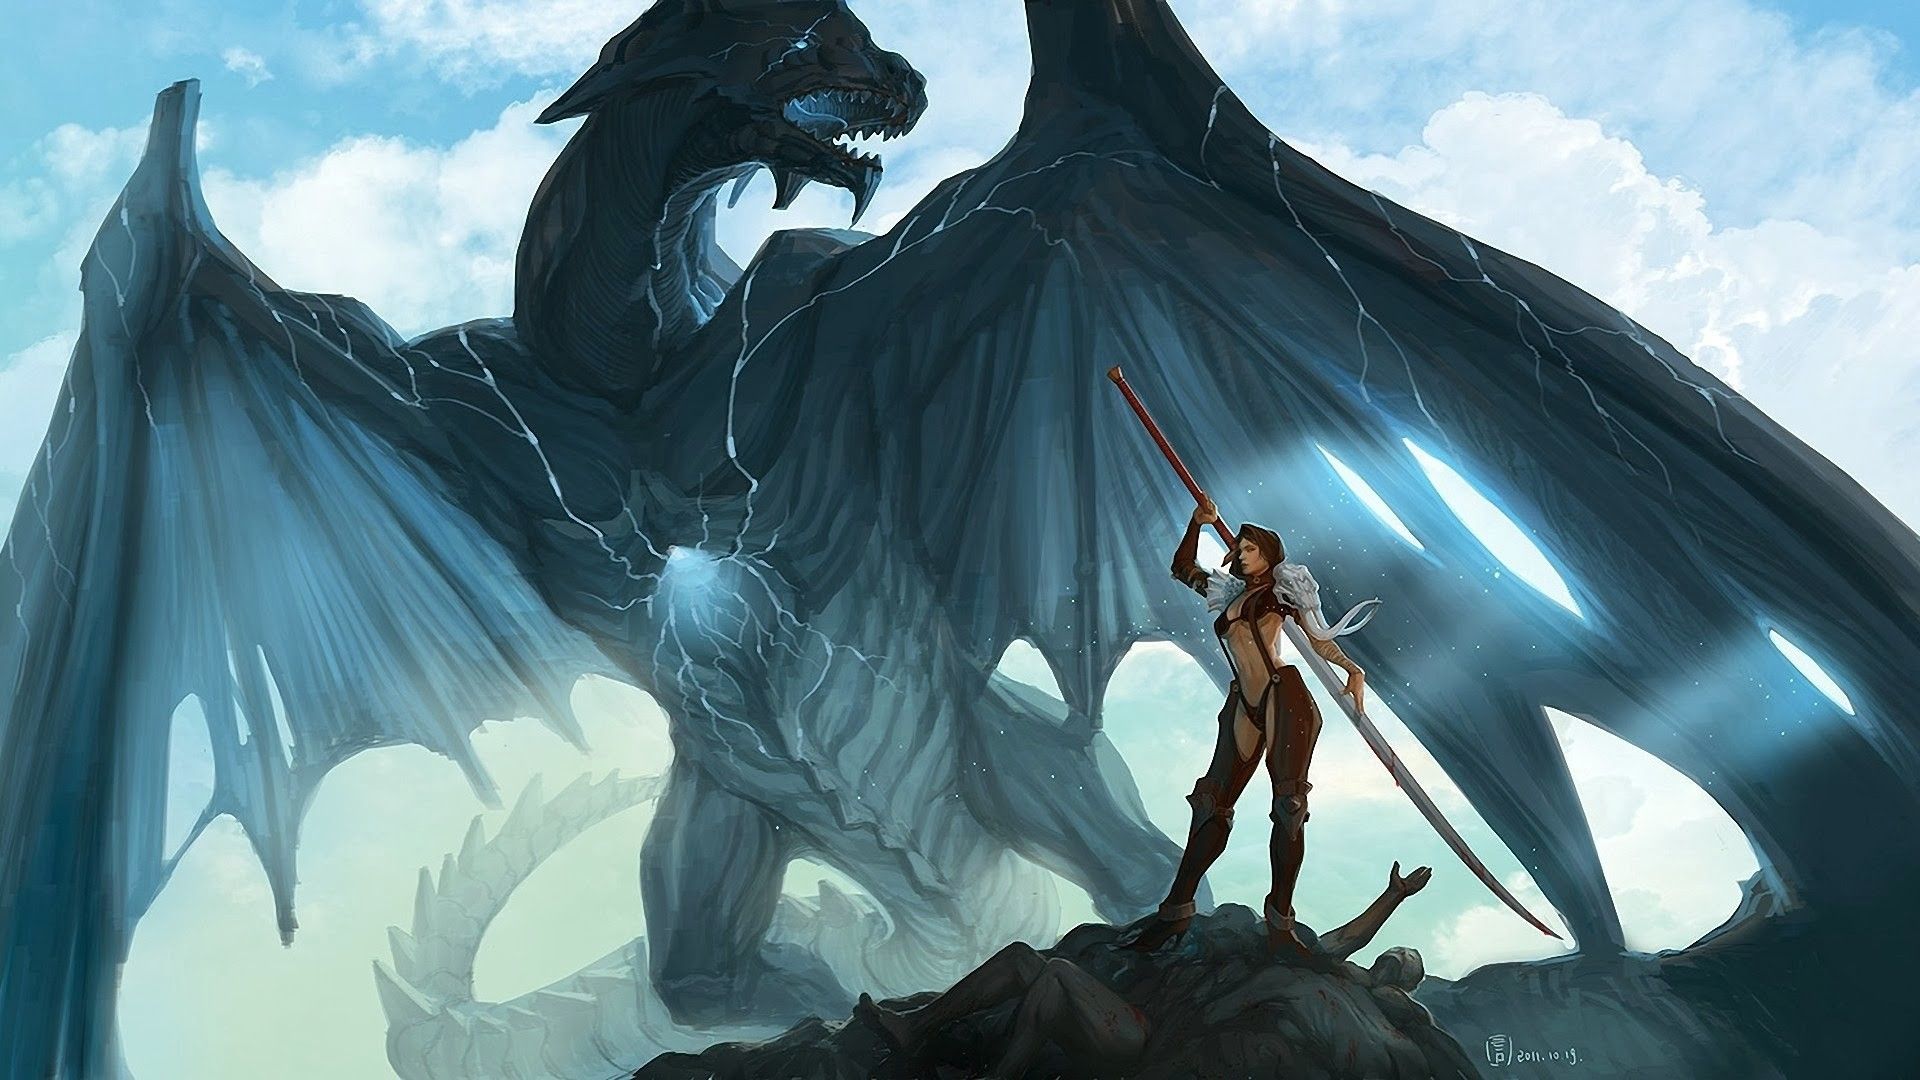 dragon fantasy warrior girl wallpaper hd 1920×1080 a691.